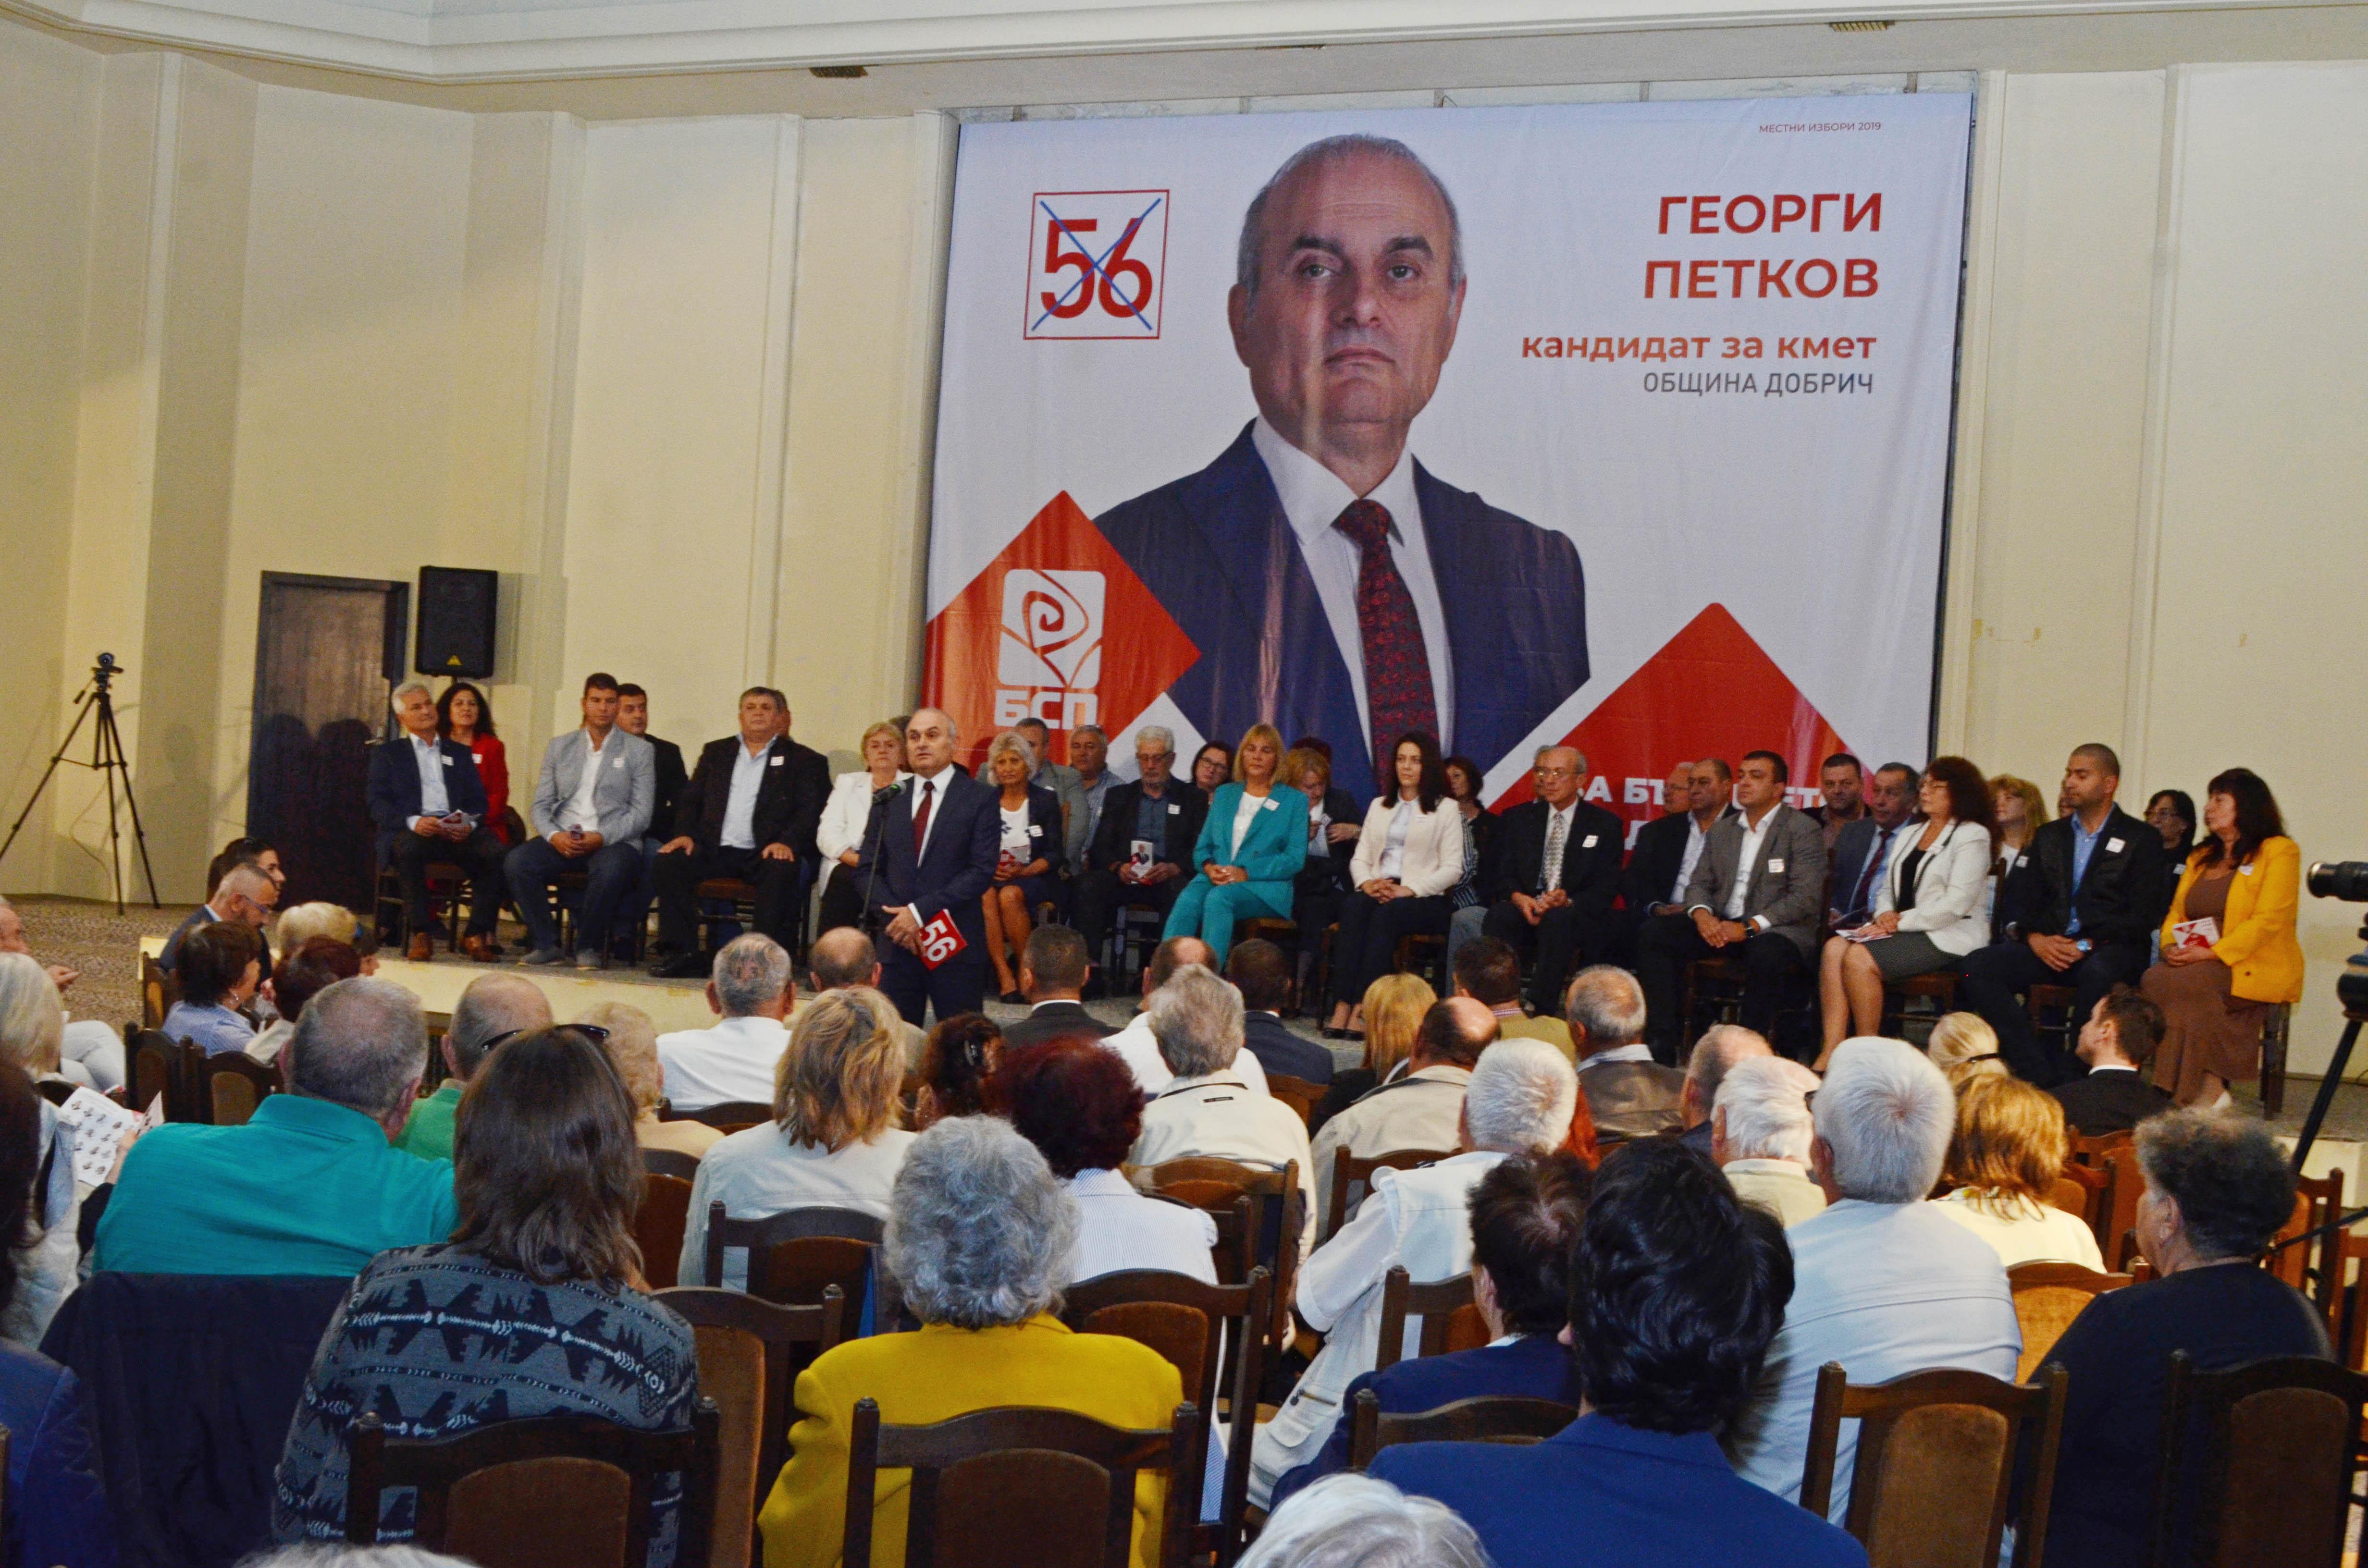 BSP-Gpetkov13